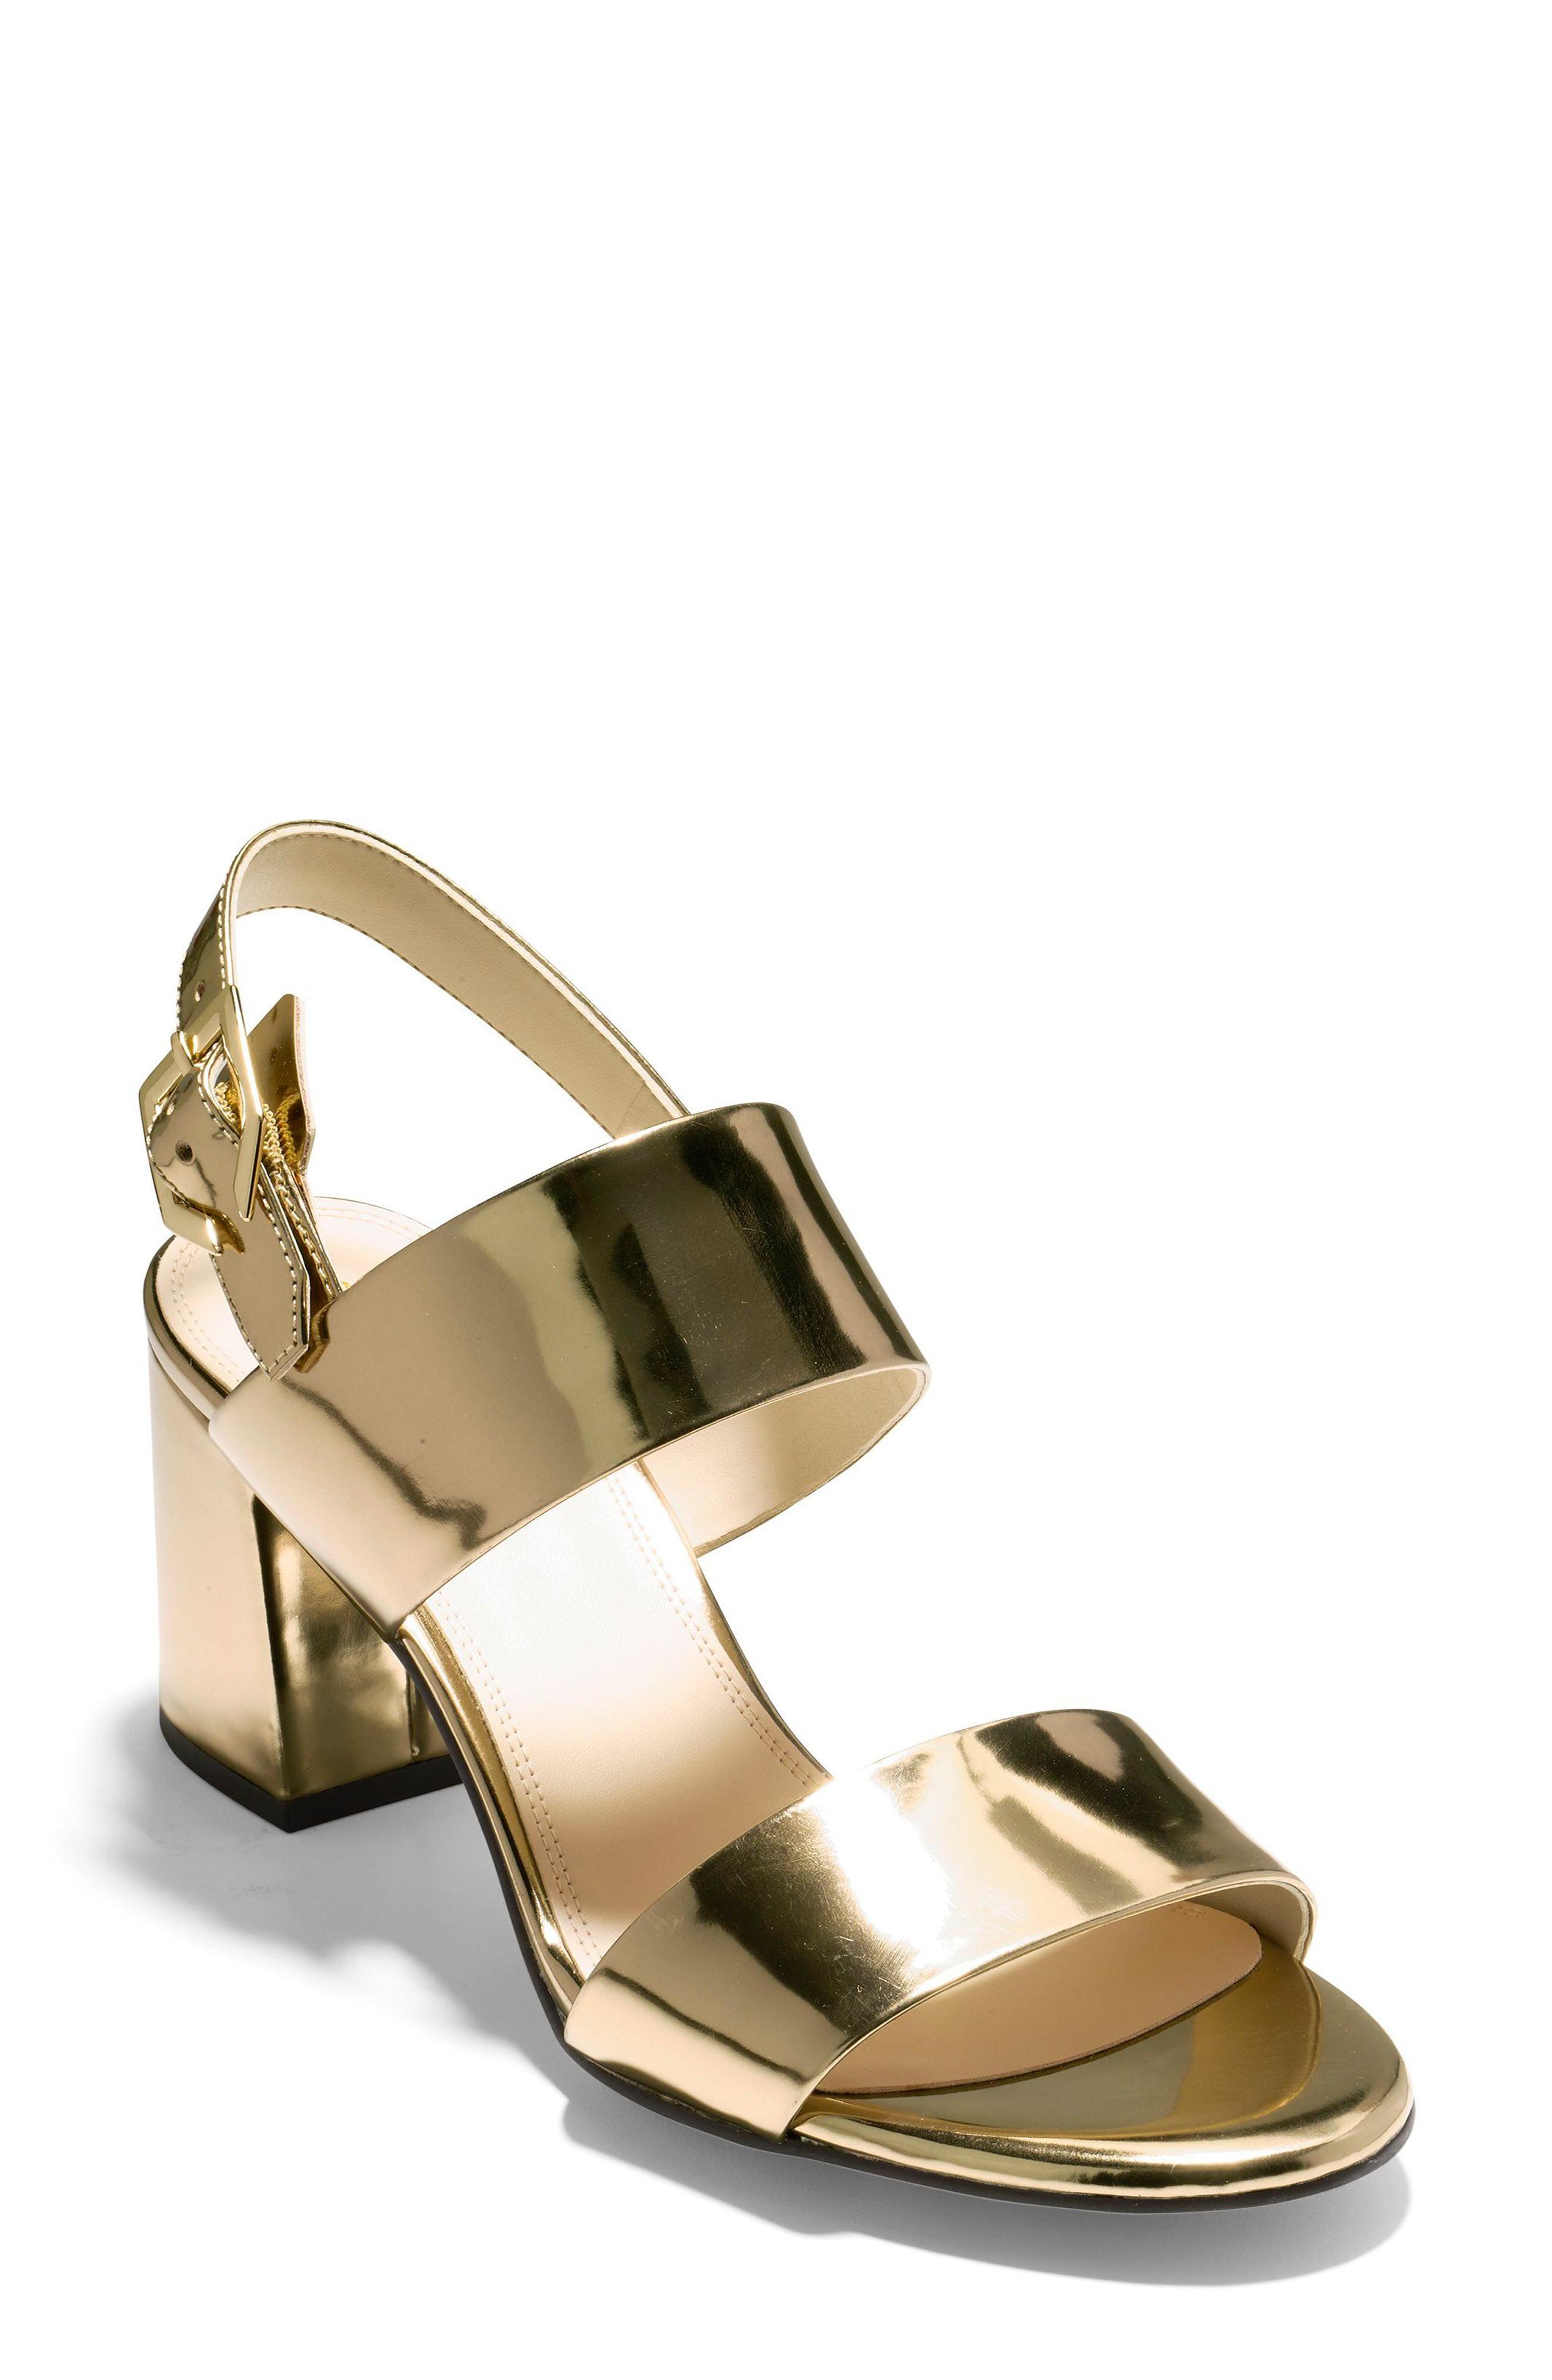 c9277373bc0 Cole Haan Avani Block Heel Sandal In Gold Leather